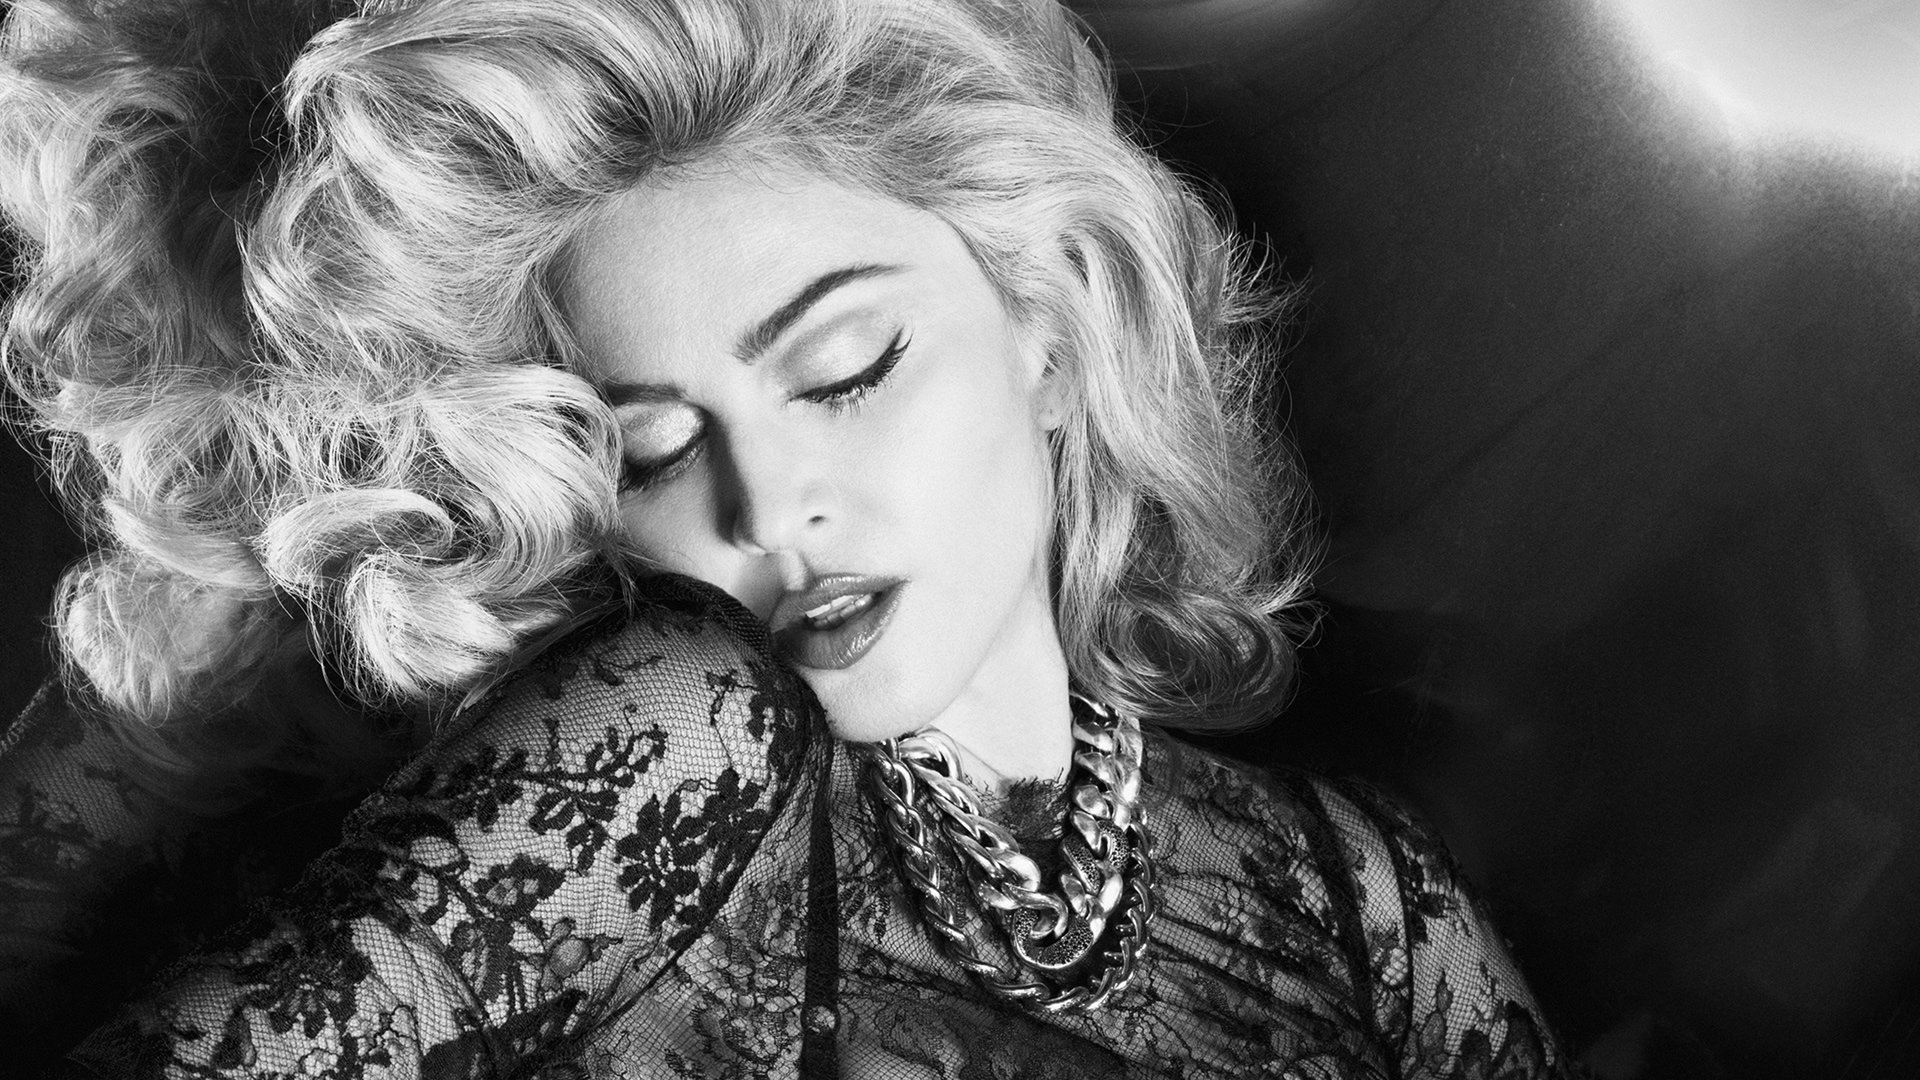 Madonna wallpapers hd for desktop backgrounds - Madonna hd images ...